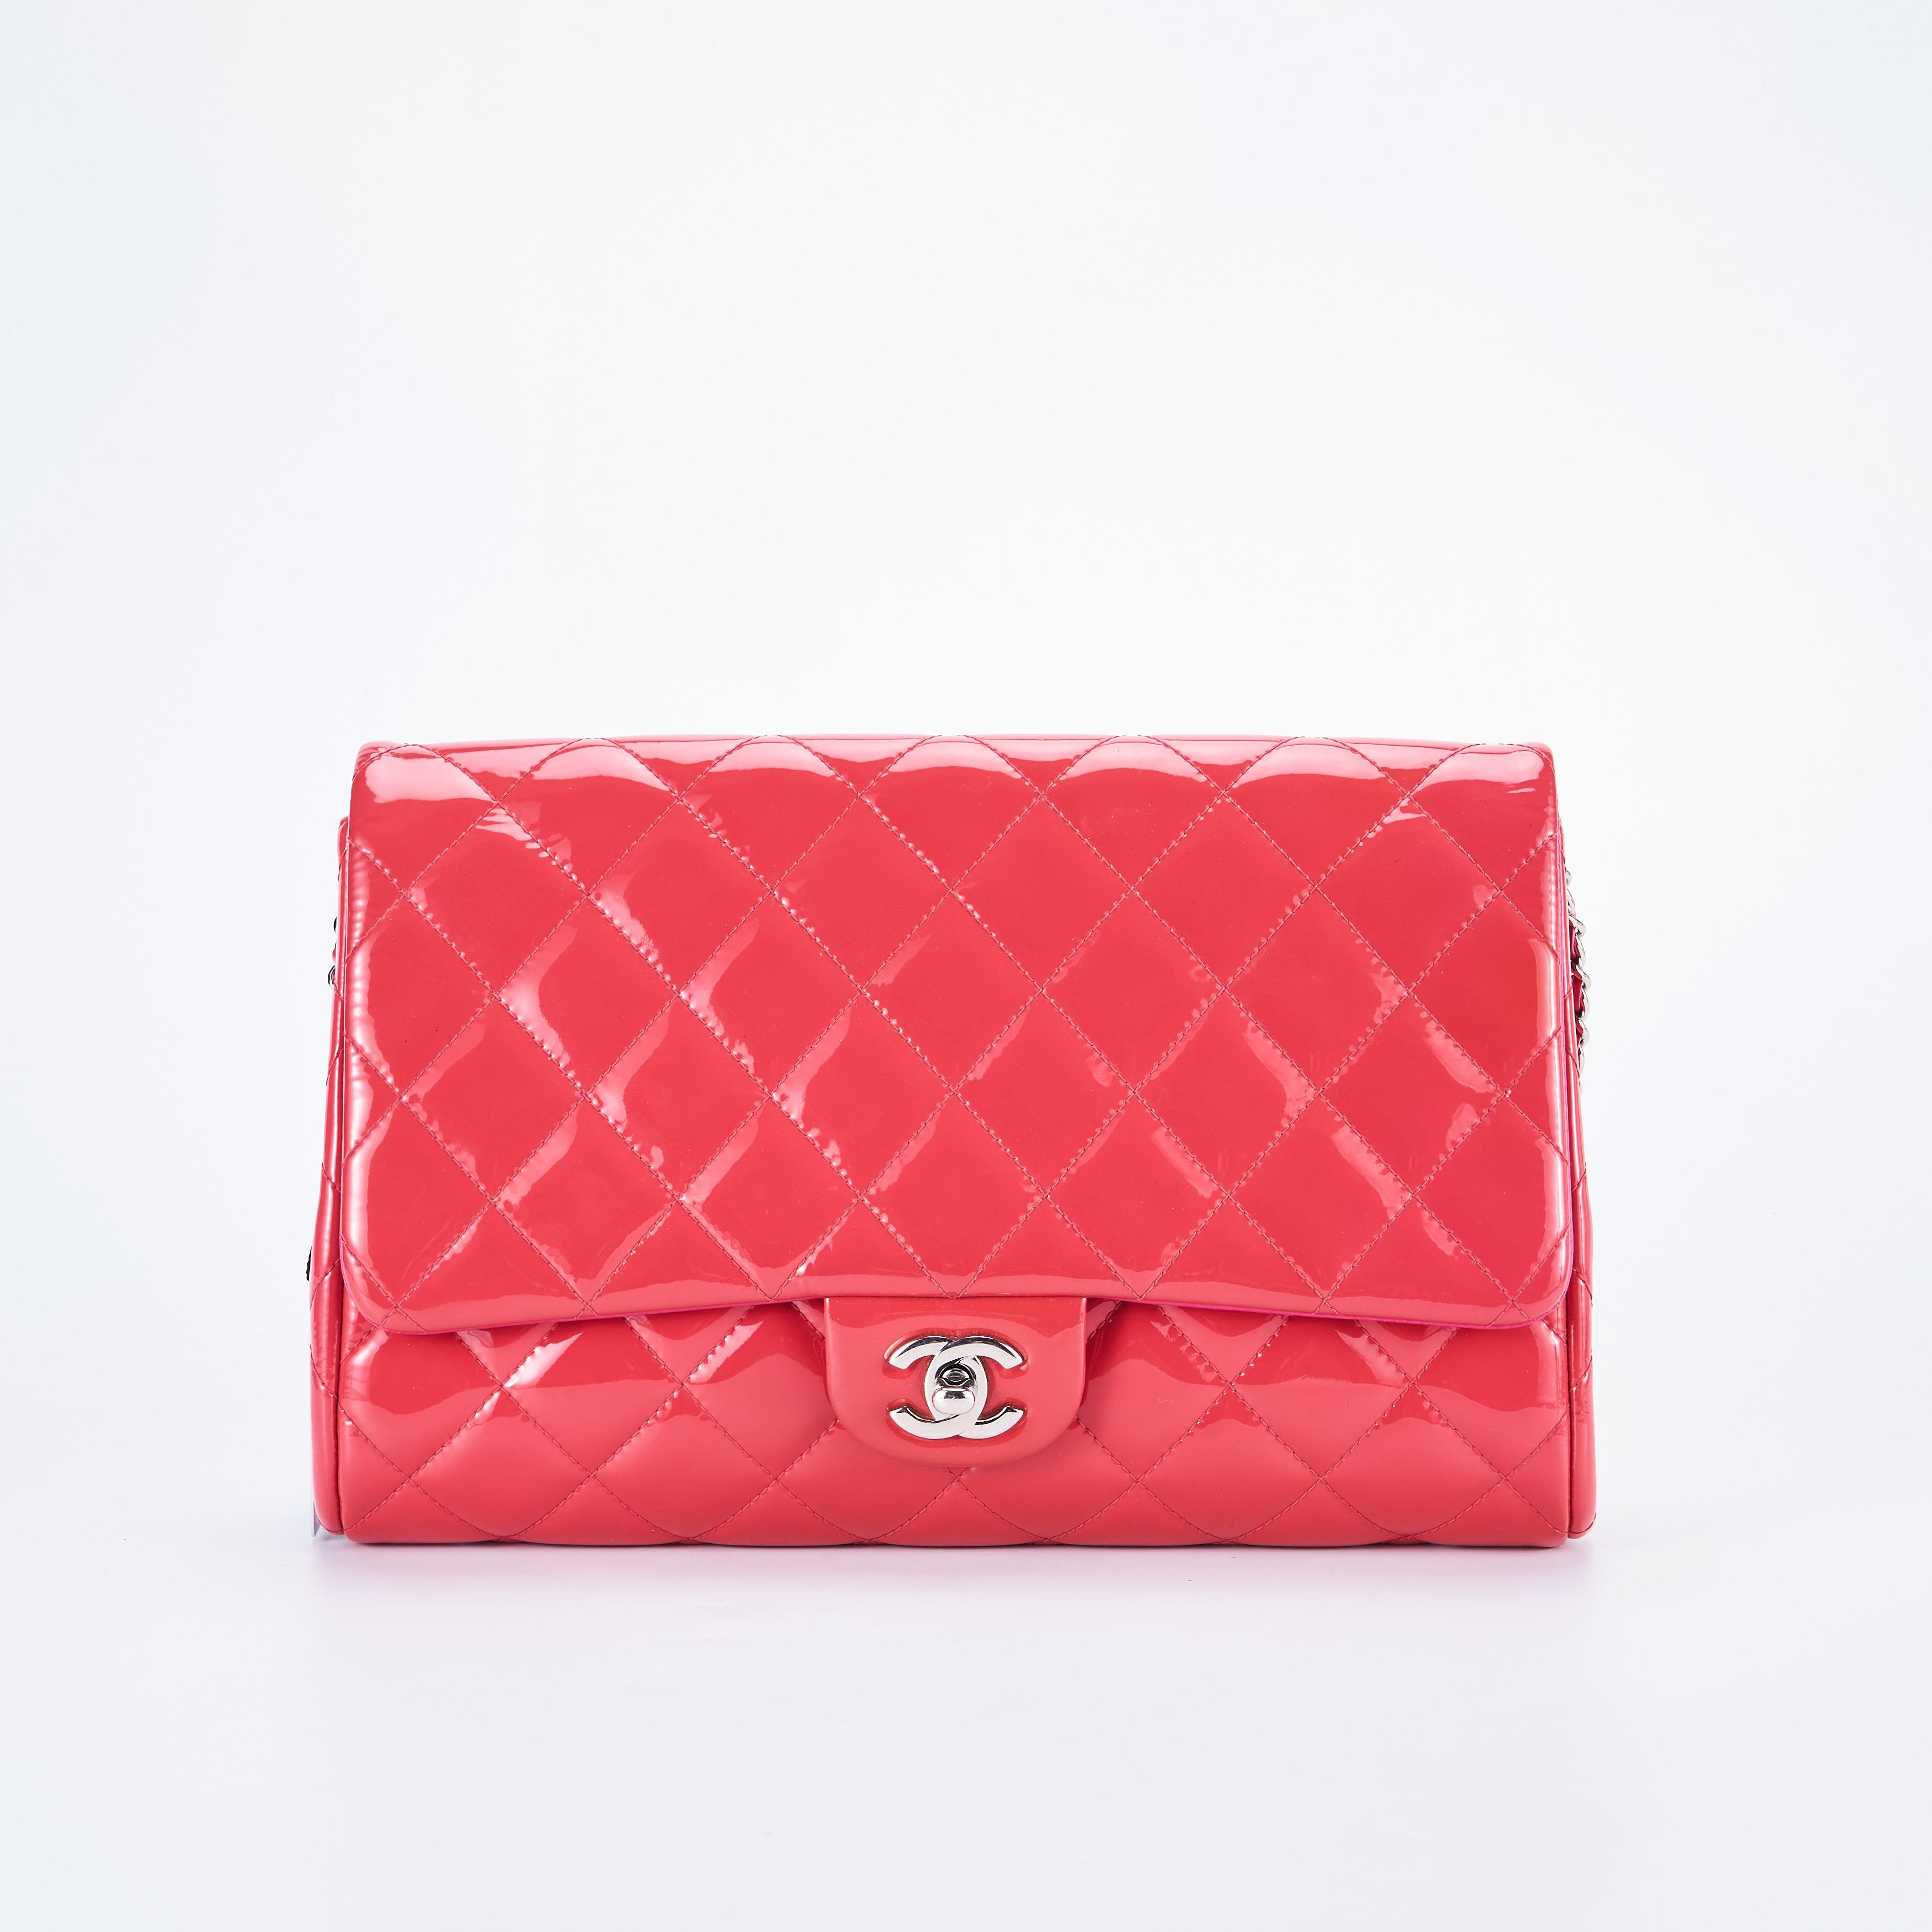 chanel链条包 临时【95新】Chanel香奈儿 漆皮链条包 公价¥15900_推荐淘宝好看的chanel链条包